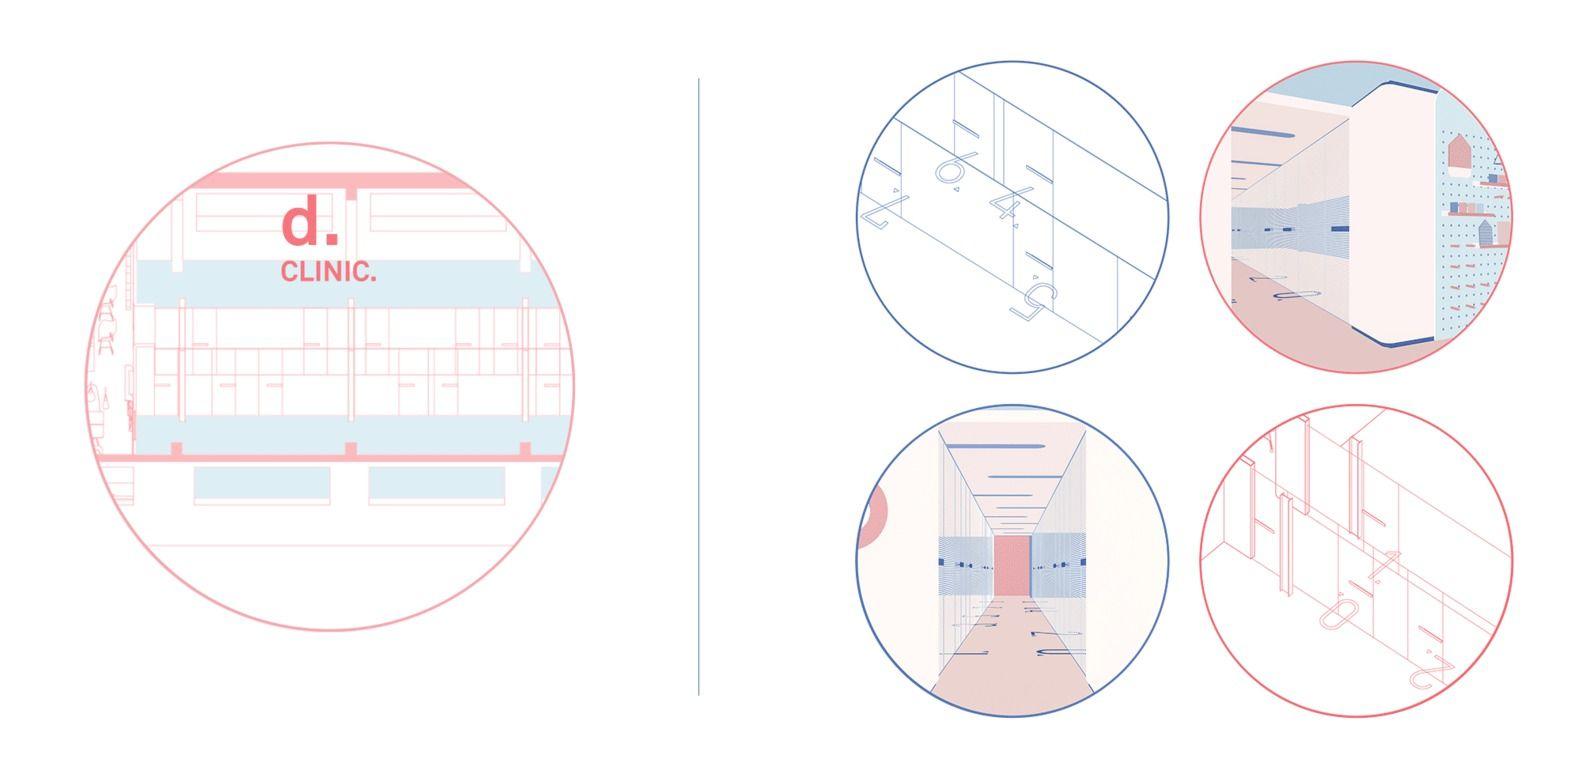 Gallery of A Warm Clinic / RIGI Design - 34